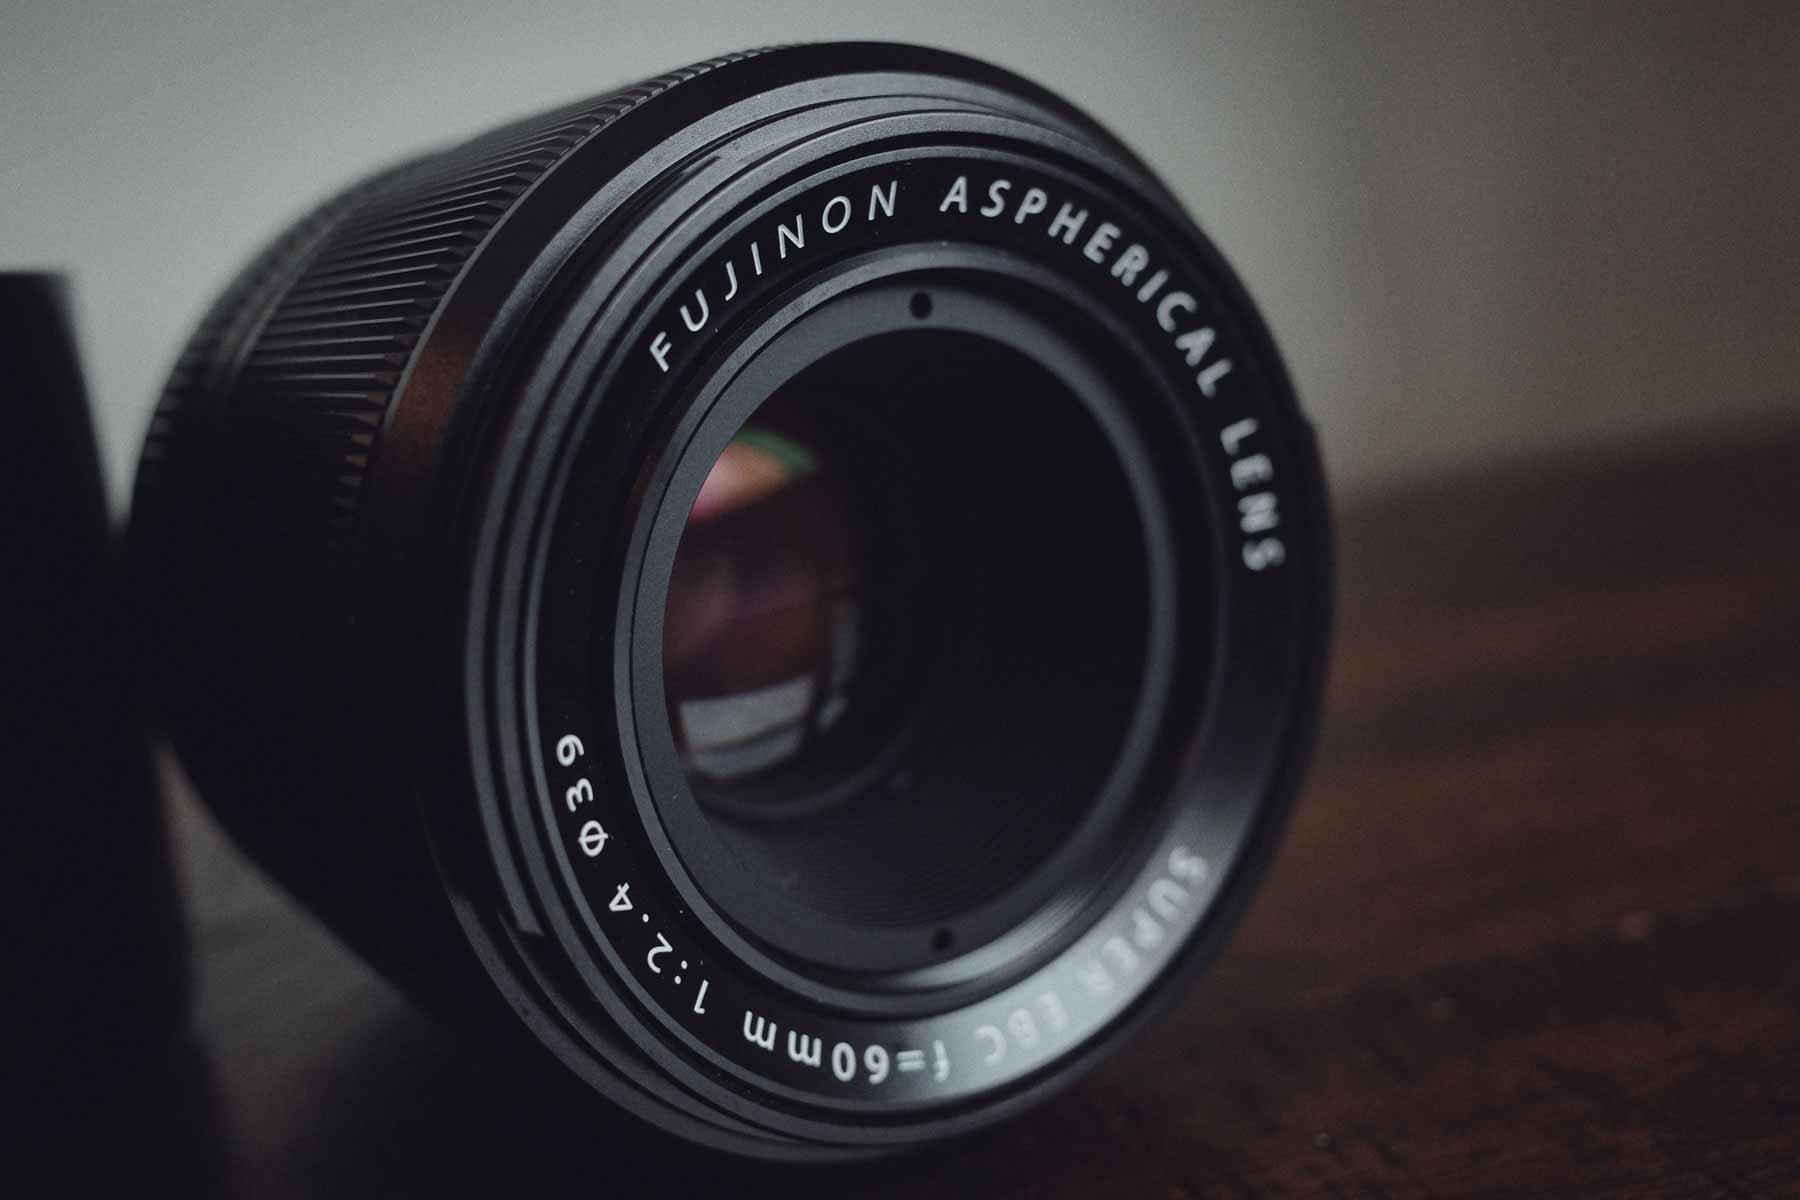 Fujifilm XF 60mm f/2.4 R Macro Lens Review Cover Image